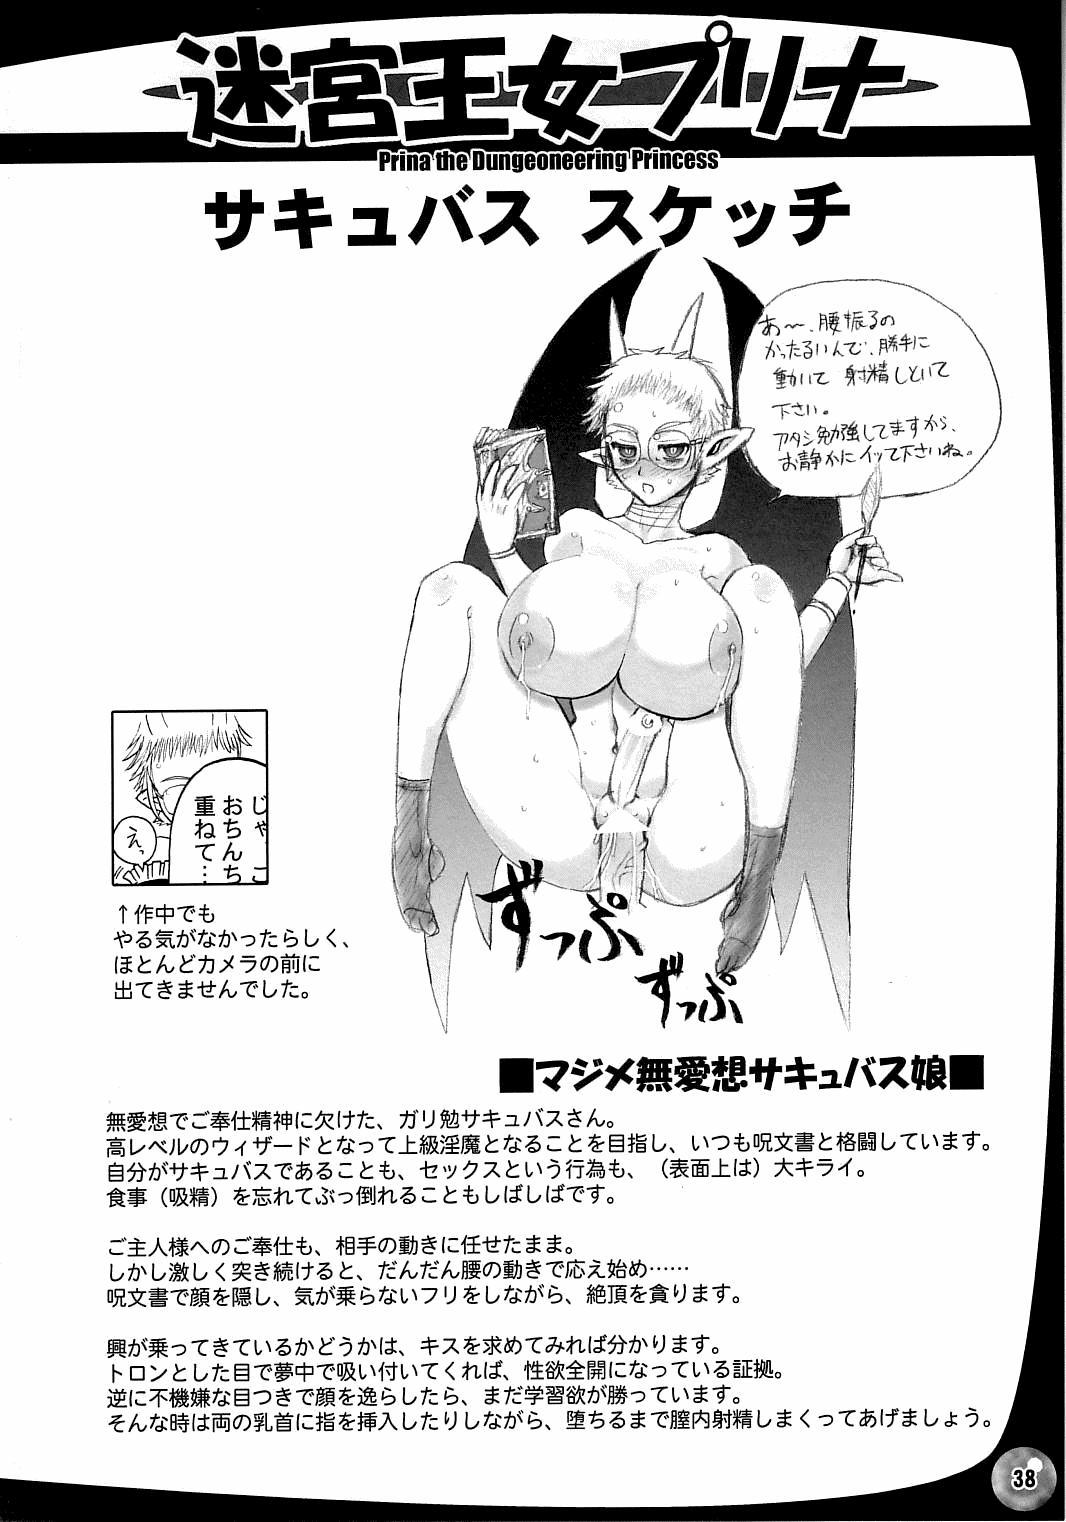 The Great Work of Alchemy Vol.15 - Meikyuu Oujo Prina 2 | Prina the Dungeoneering Princess 2 37